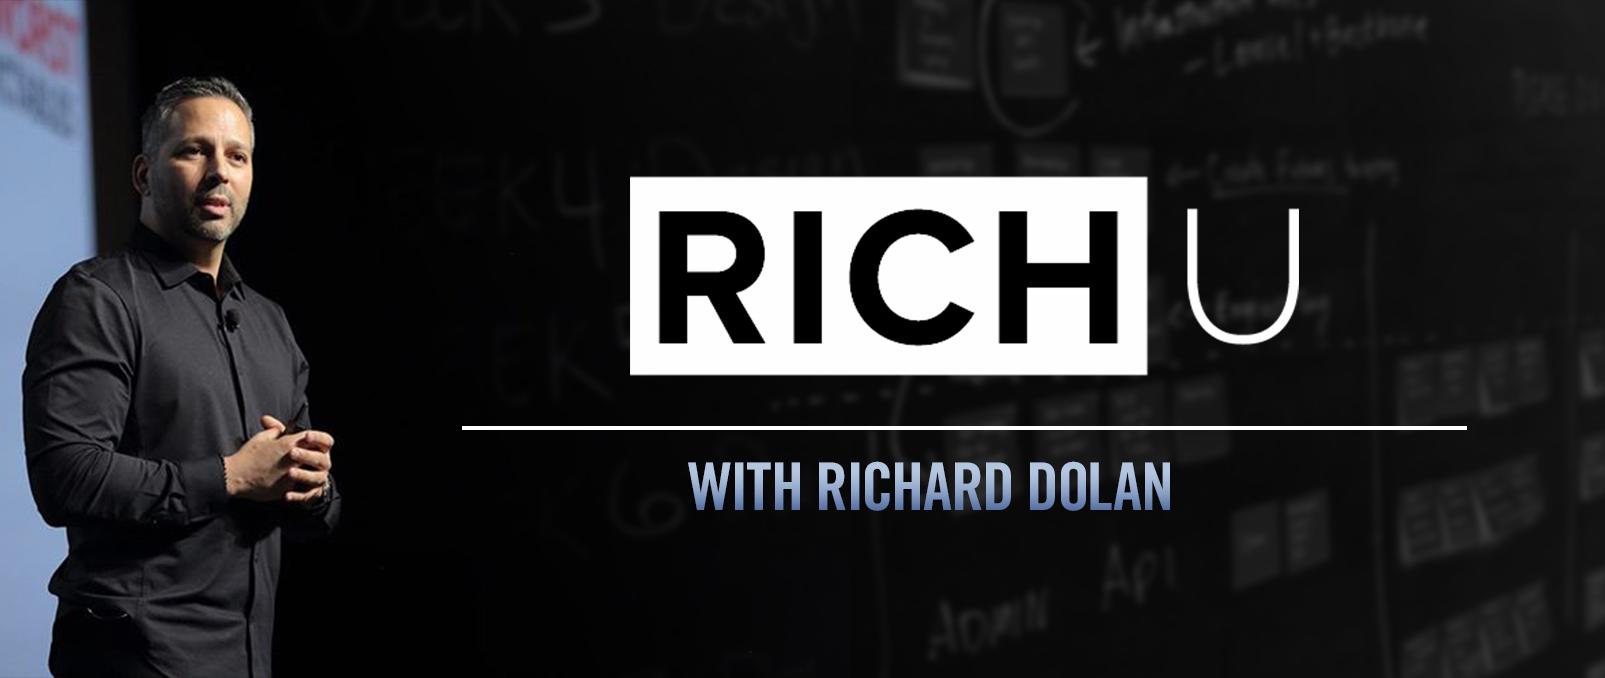 RIchU-ProductBanner.jpg